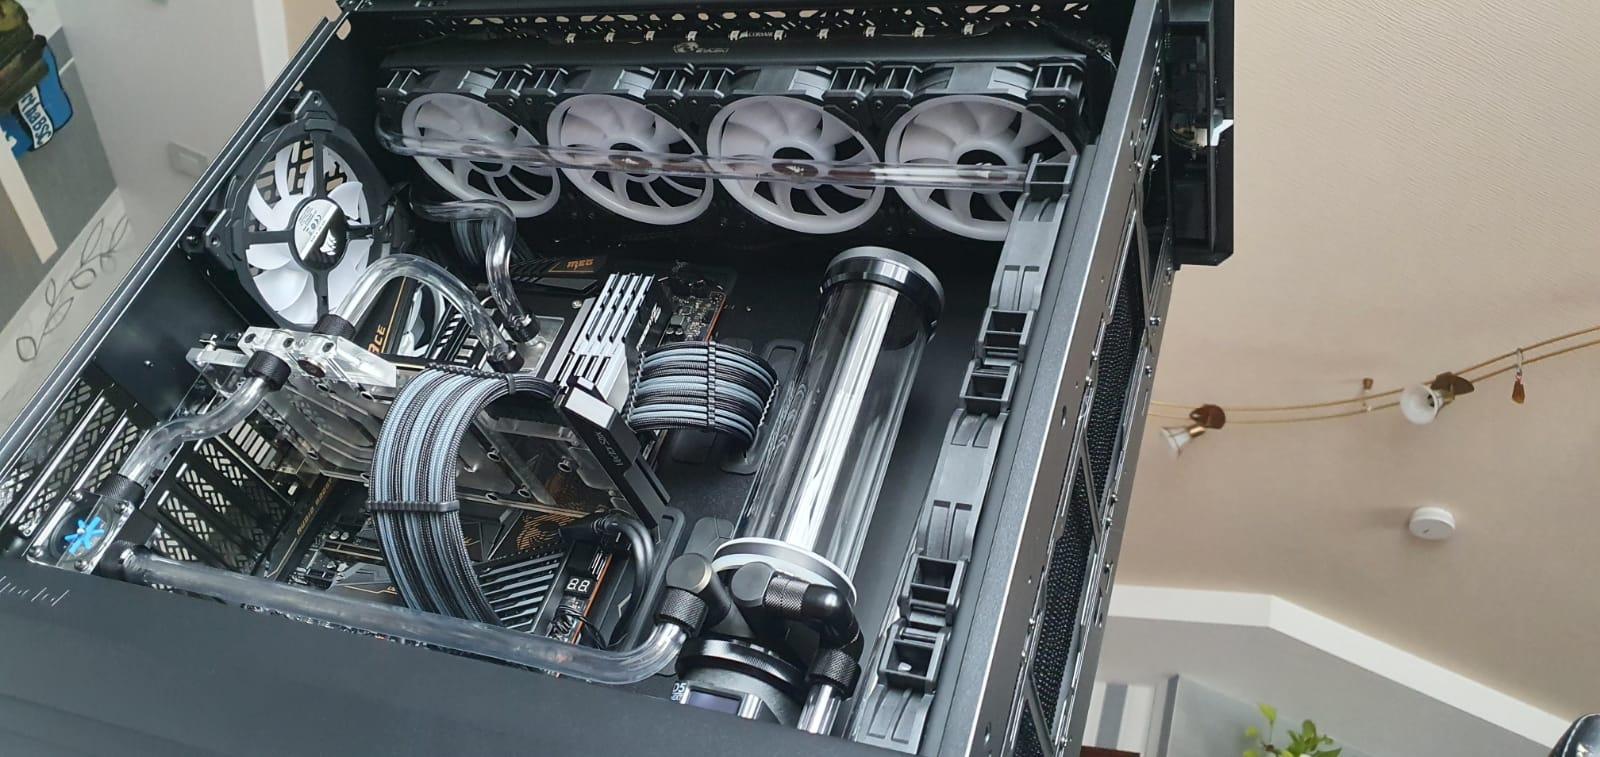 10 PC.jpg